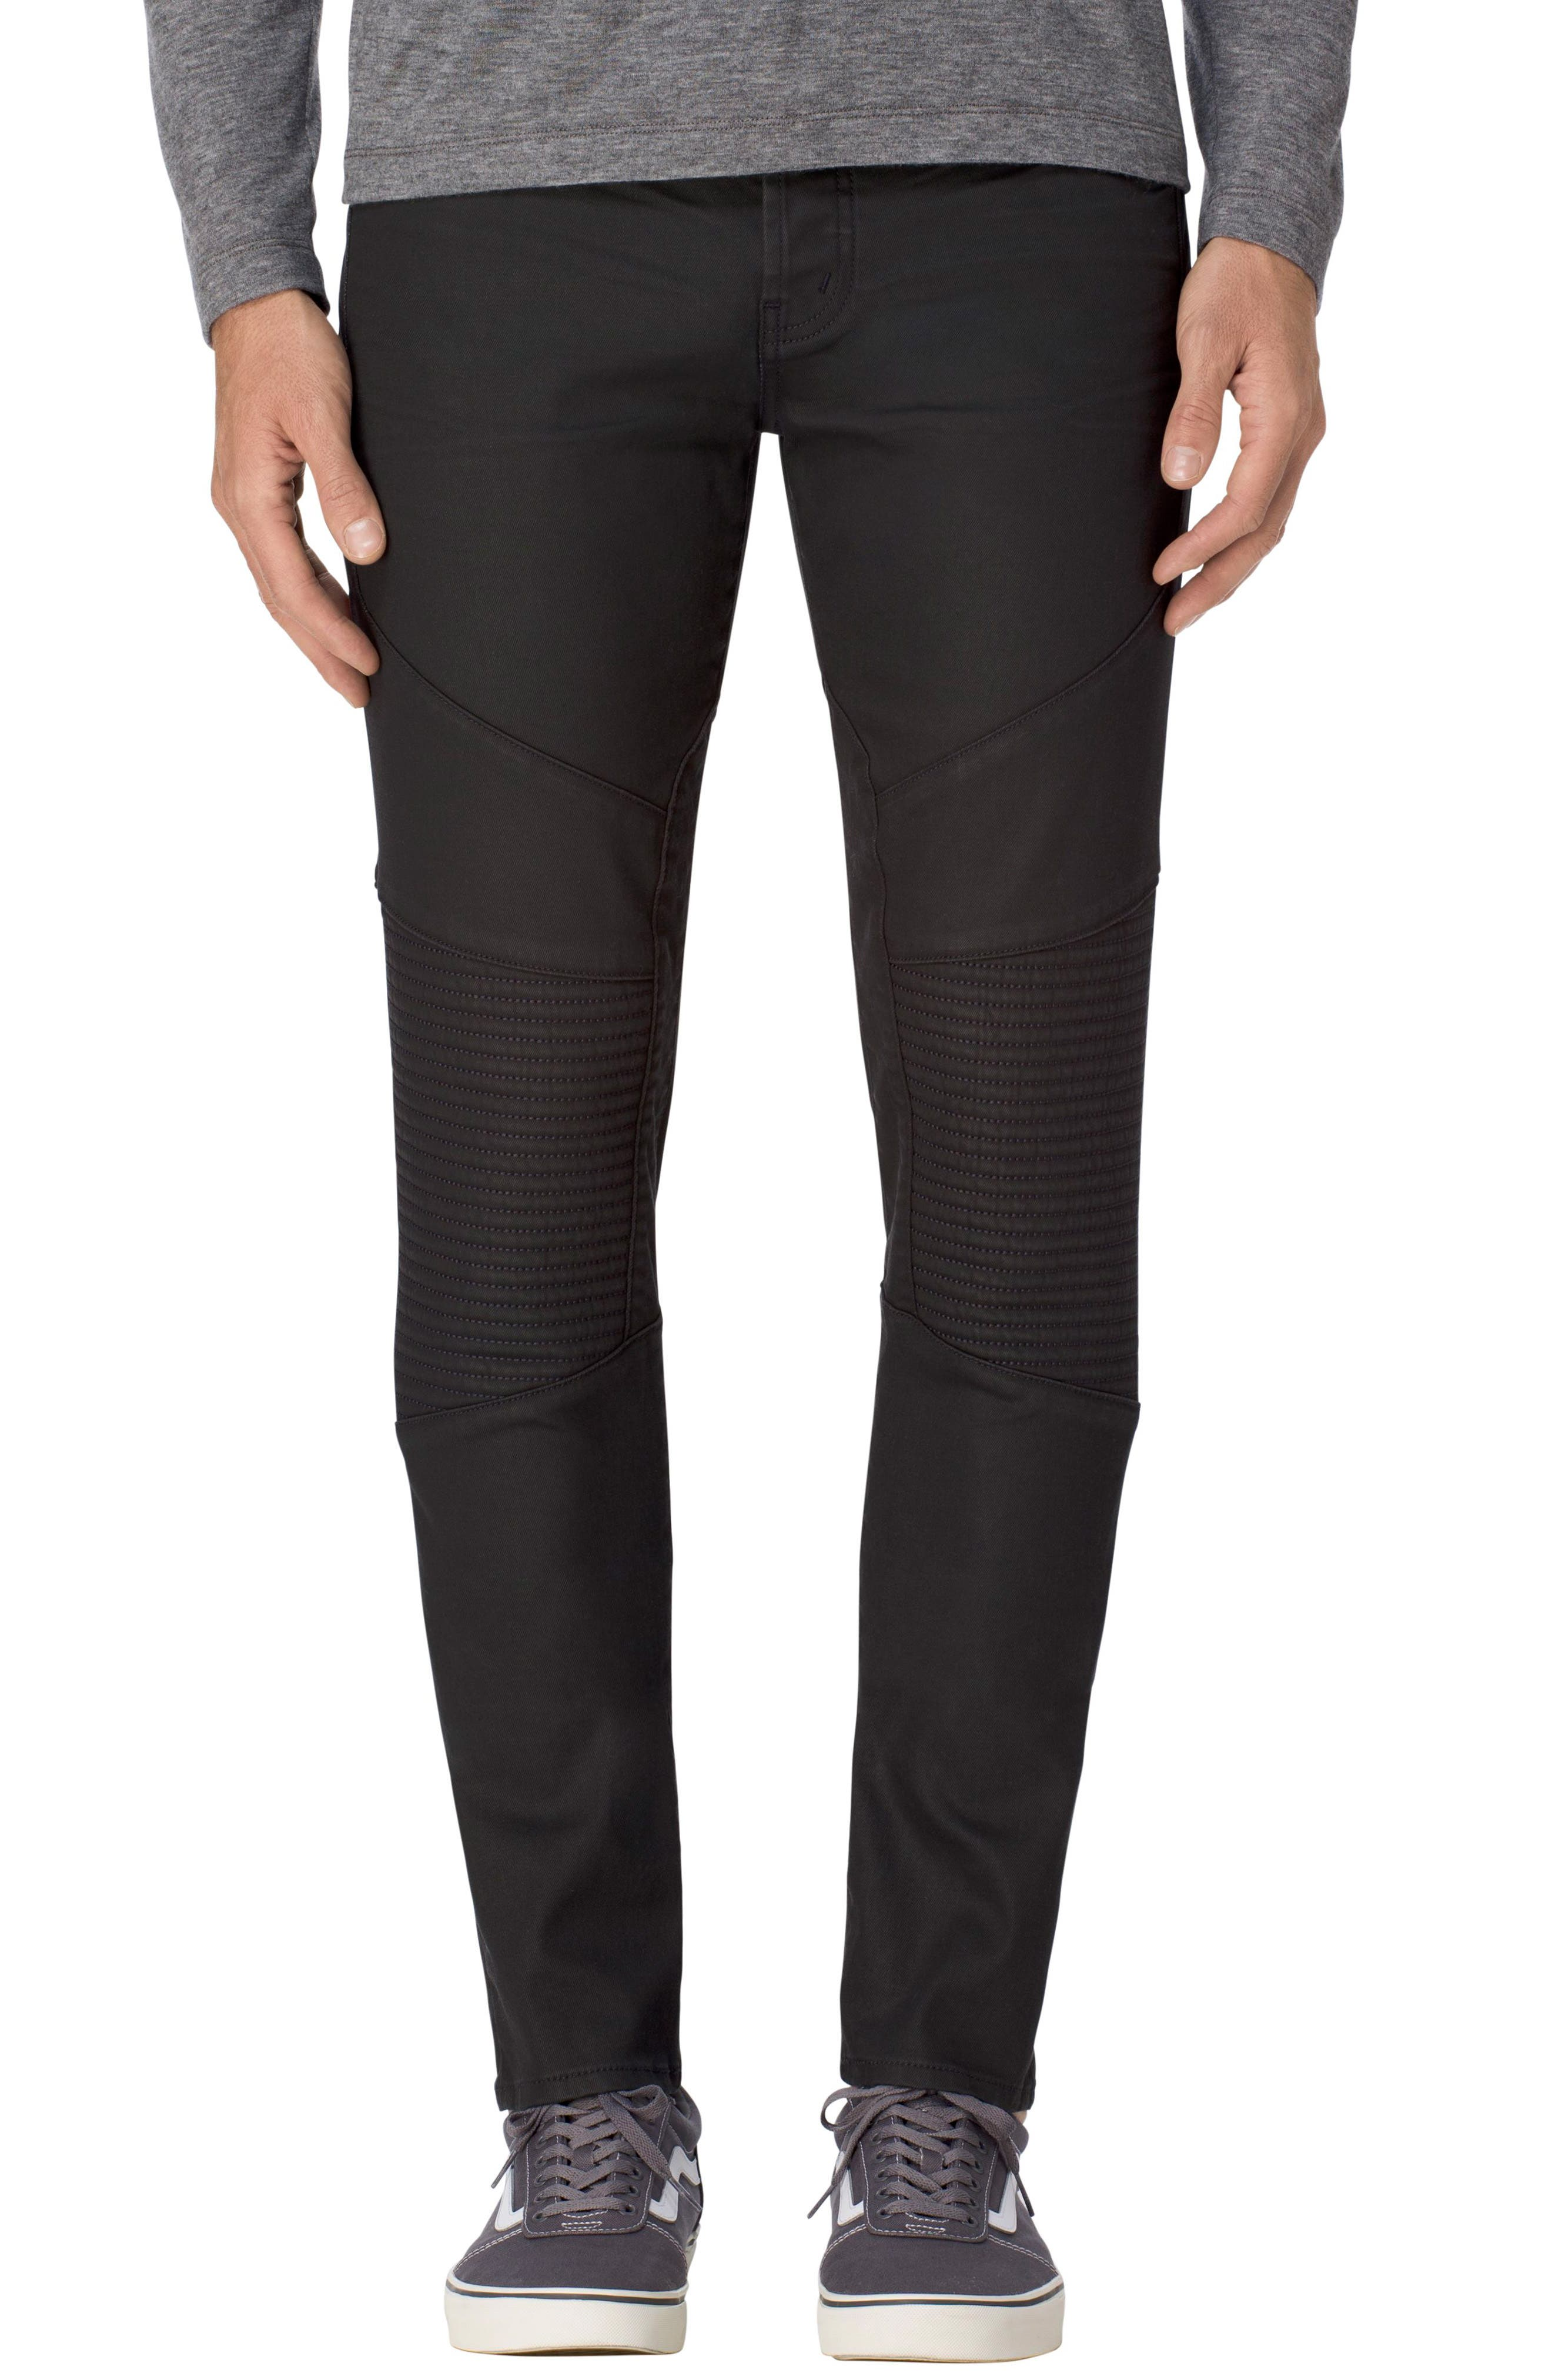 Main Image - J Brand Bearden Moto Skinny Fit Jeans (Fact)